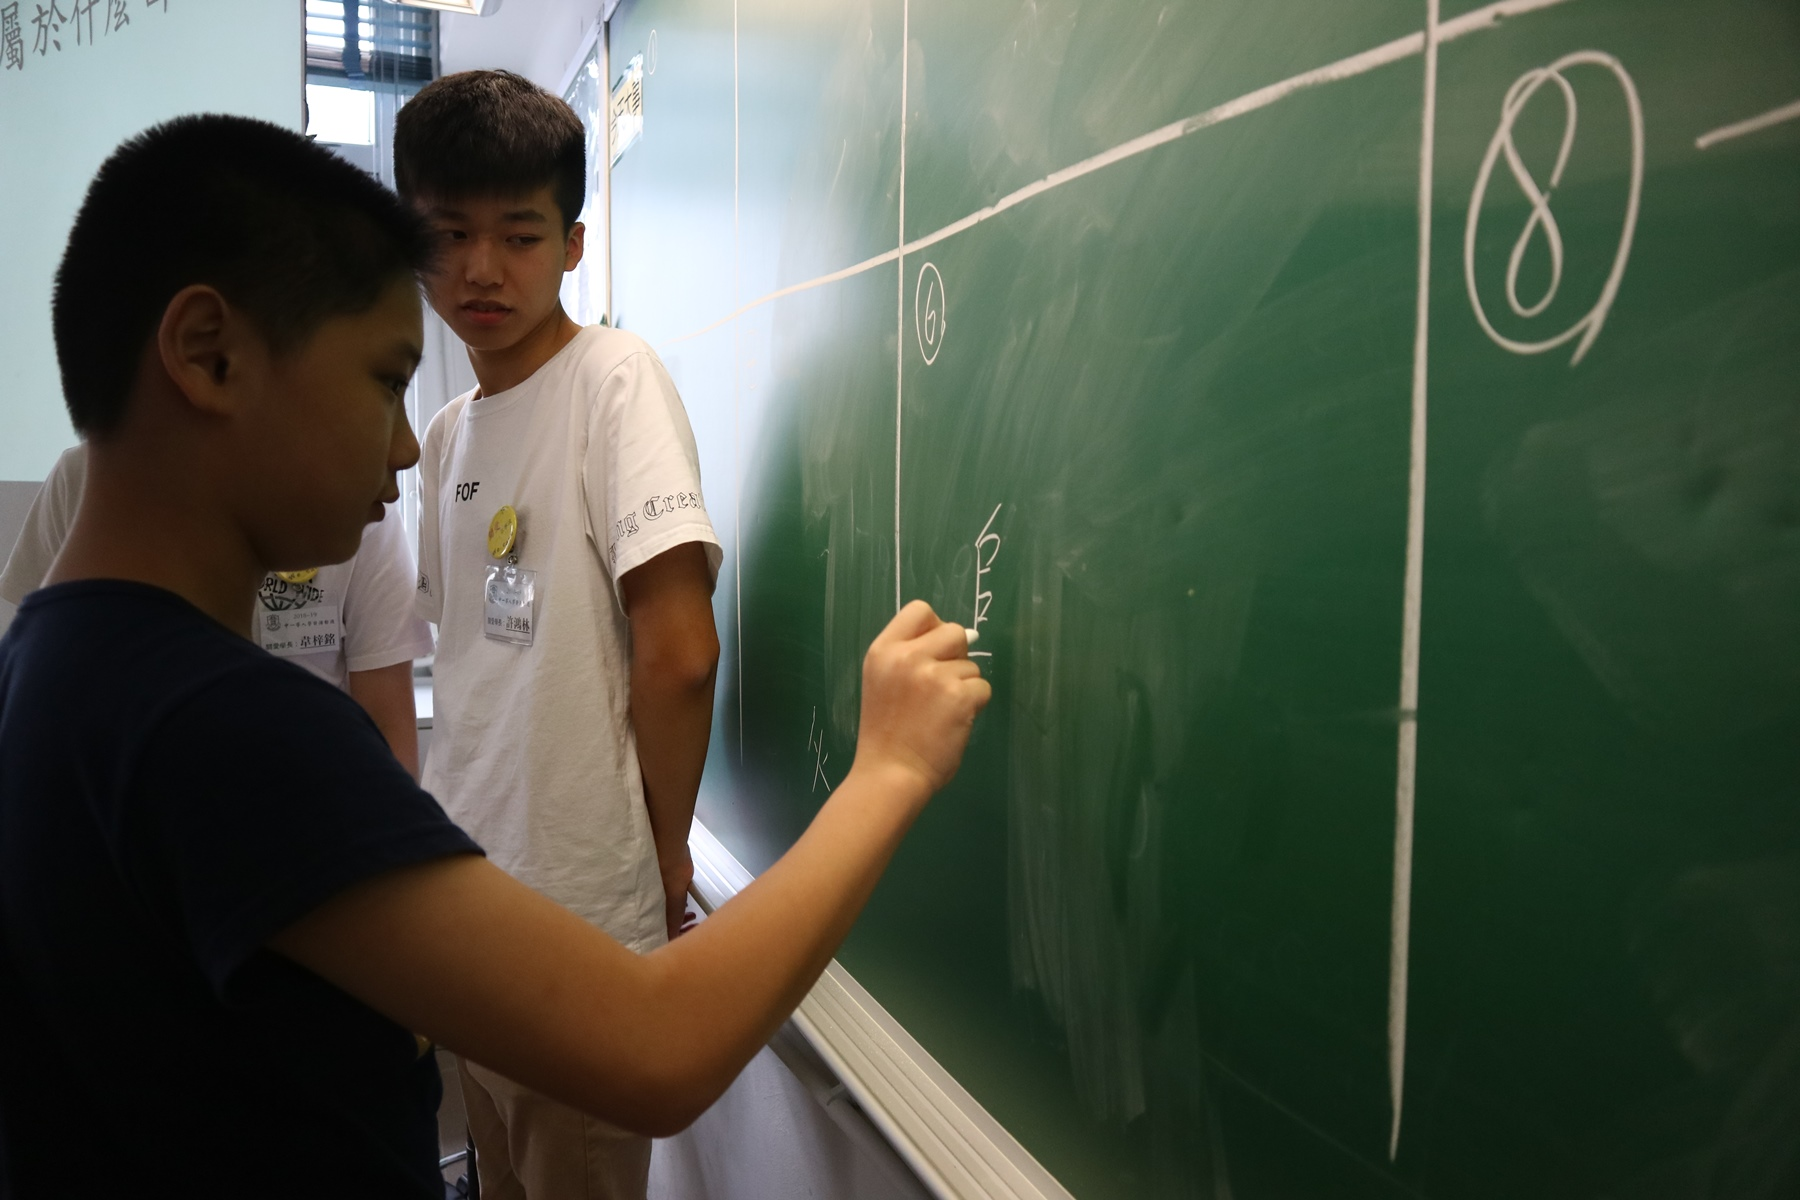 http://npc.edu.hk/sites/default/files/1b_wen_gu_zhi_xin_05.jpg